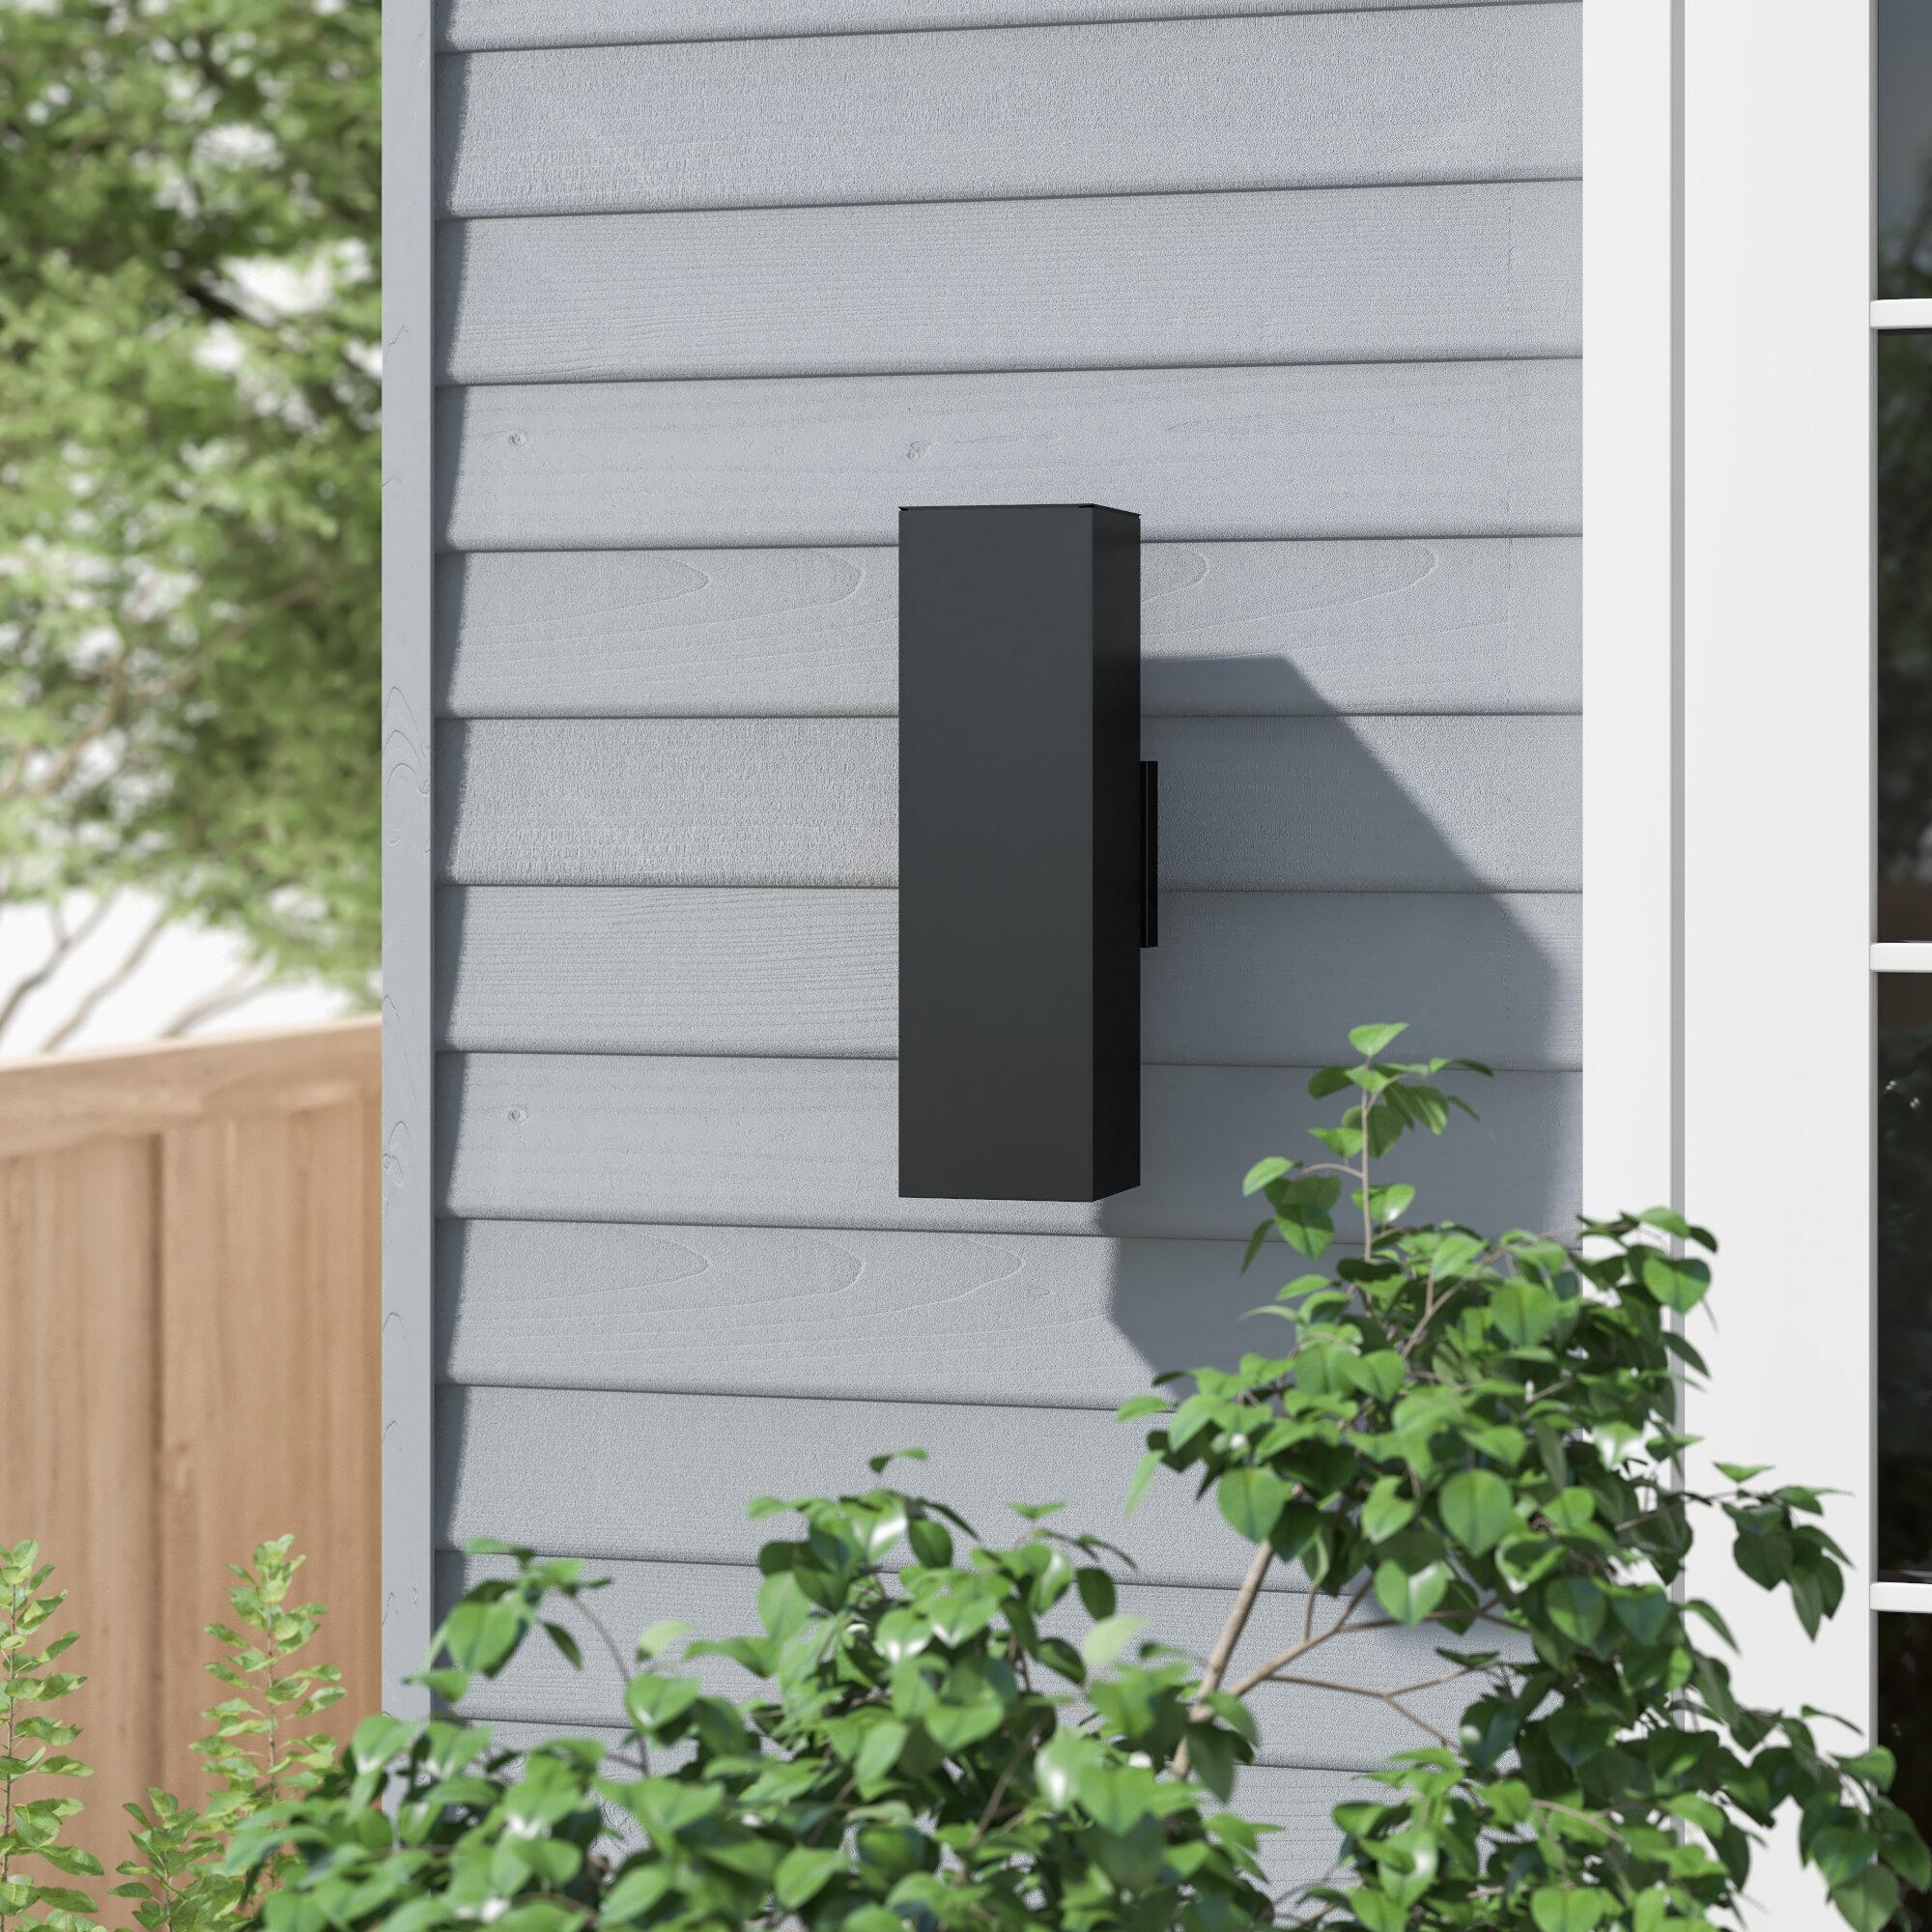 Modern Contemporary Outdoor Wall Lighting You Ll Love In 2020 Wayfair